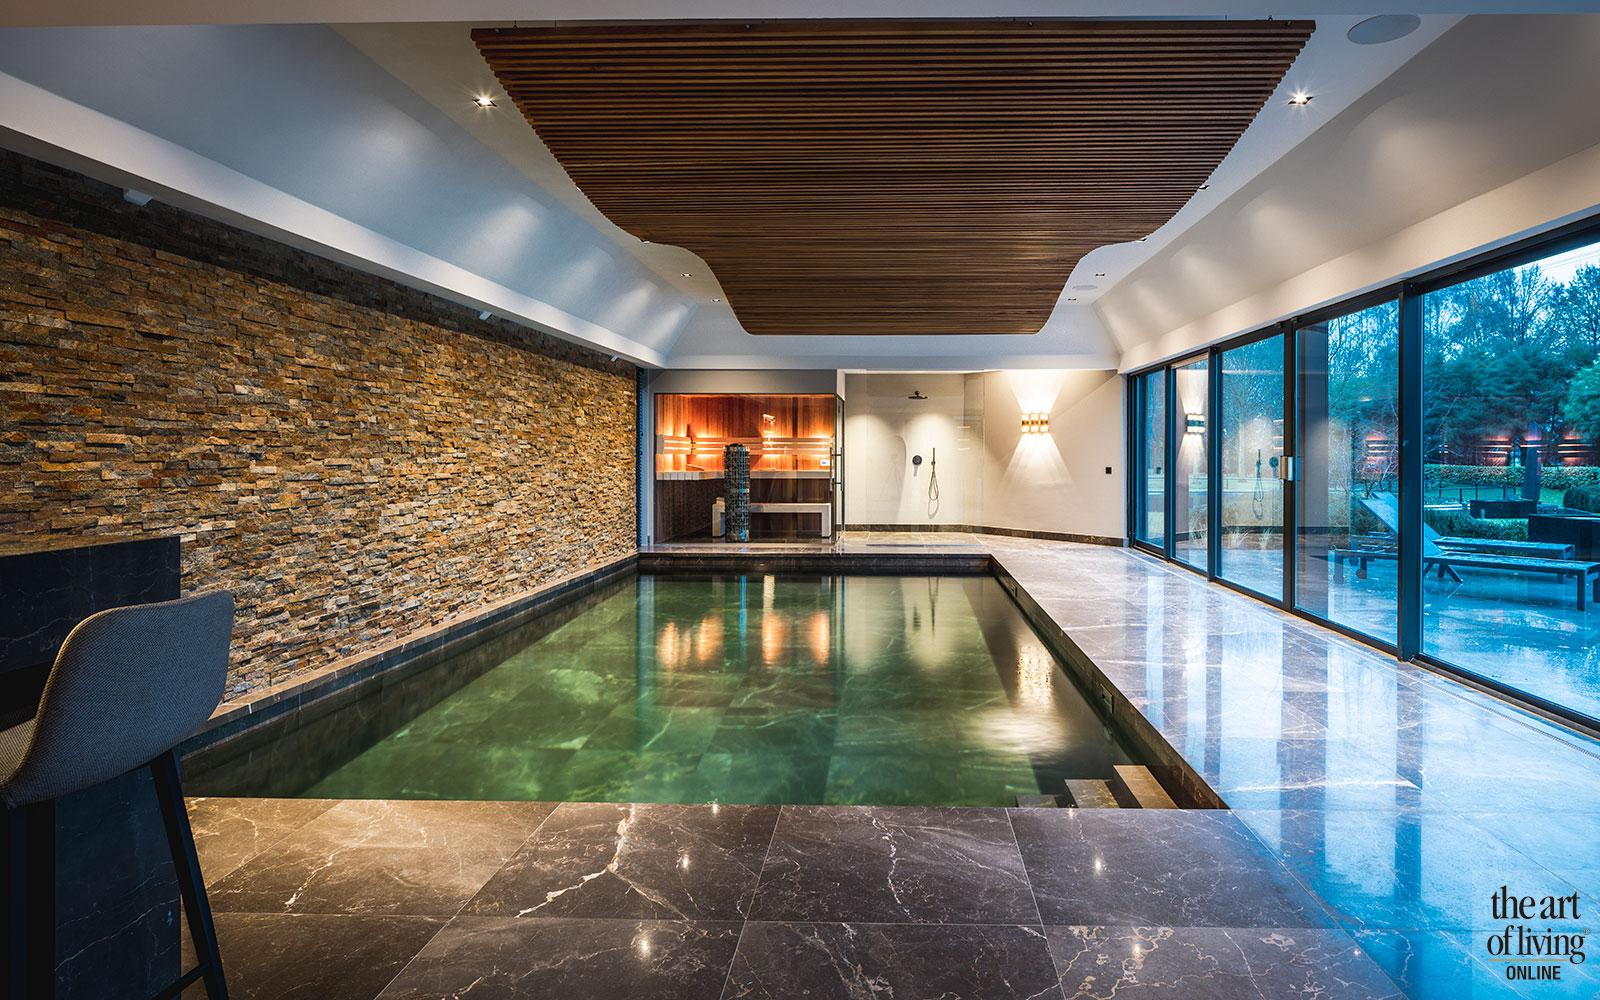 thuiswellness | Huis van Strijdhoven, the art of living